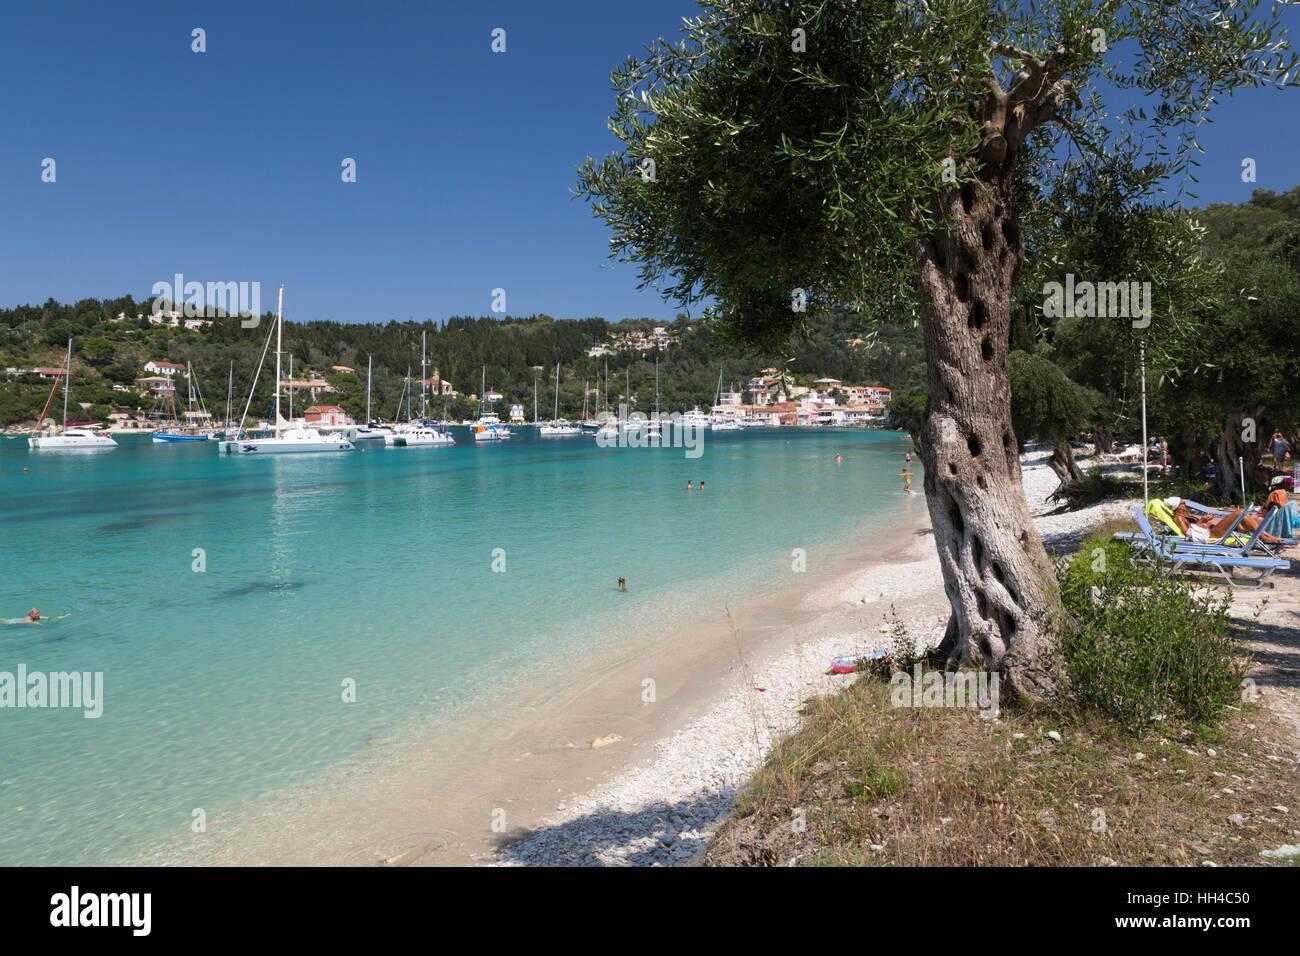 Pebble beach and bay, Lakka, Paxos, Ionian Islands, Greek Islands, Greece, Europe - Stock Image